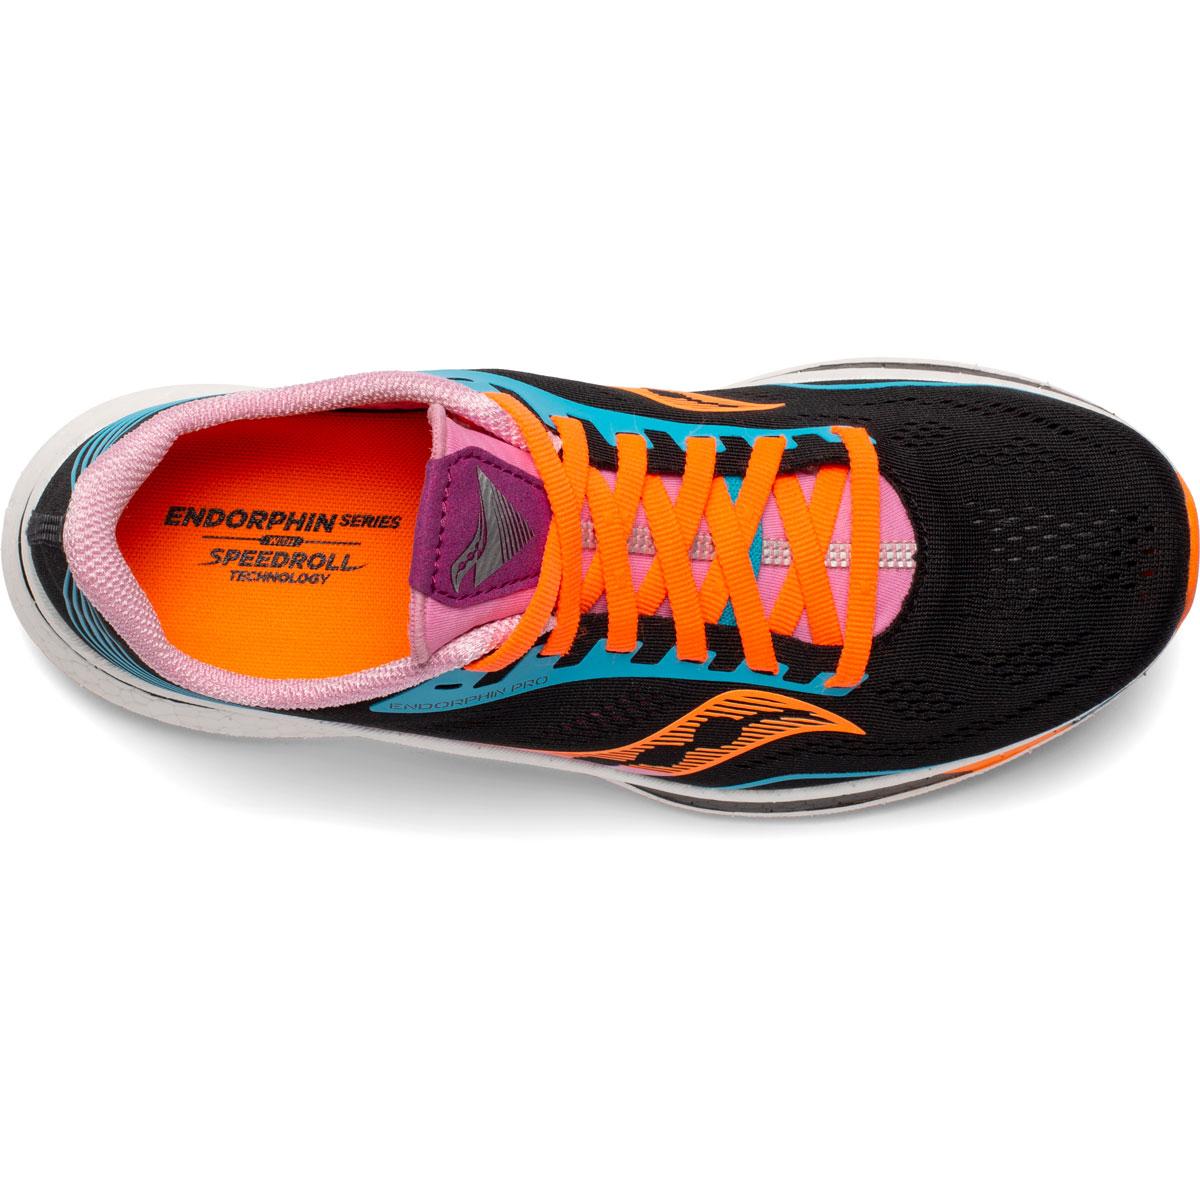 Women's Saucony Endorphin Pro Running Shoe - Color: Future/Black - Size: 5 - Width: Regular, Future/Black, large, image 3